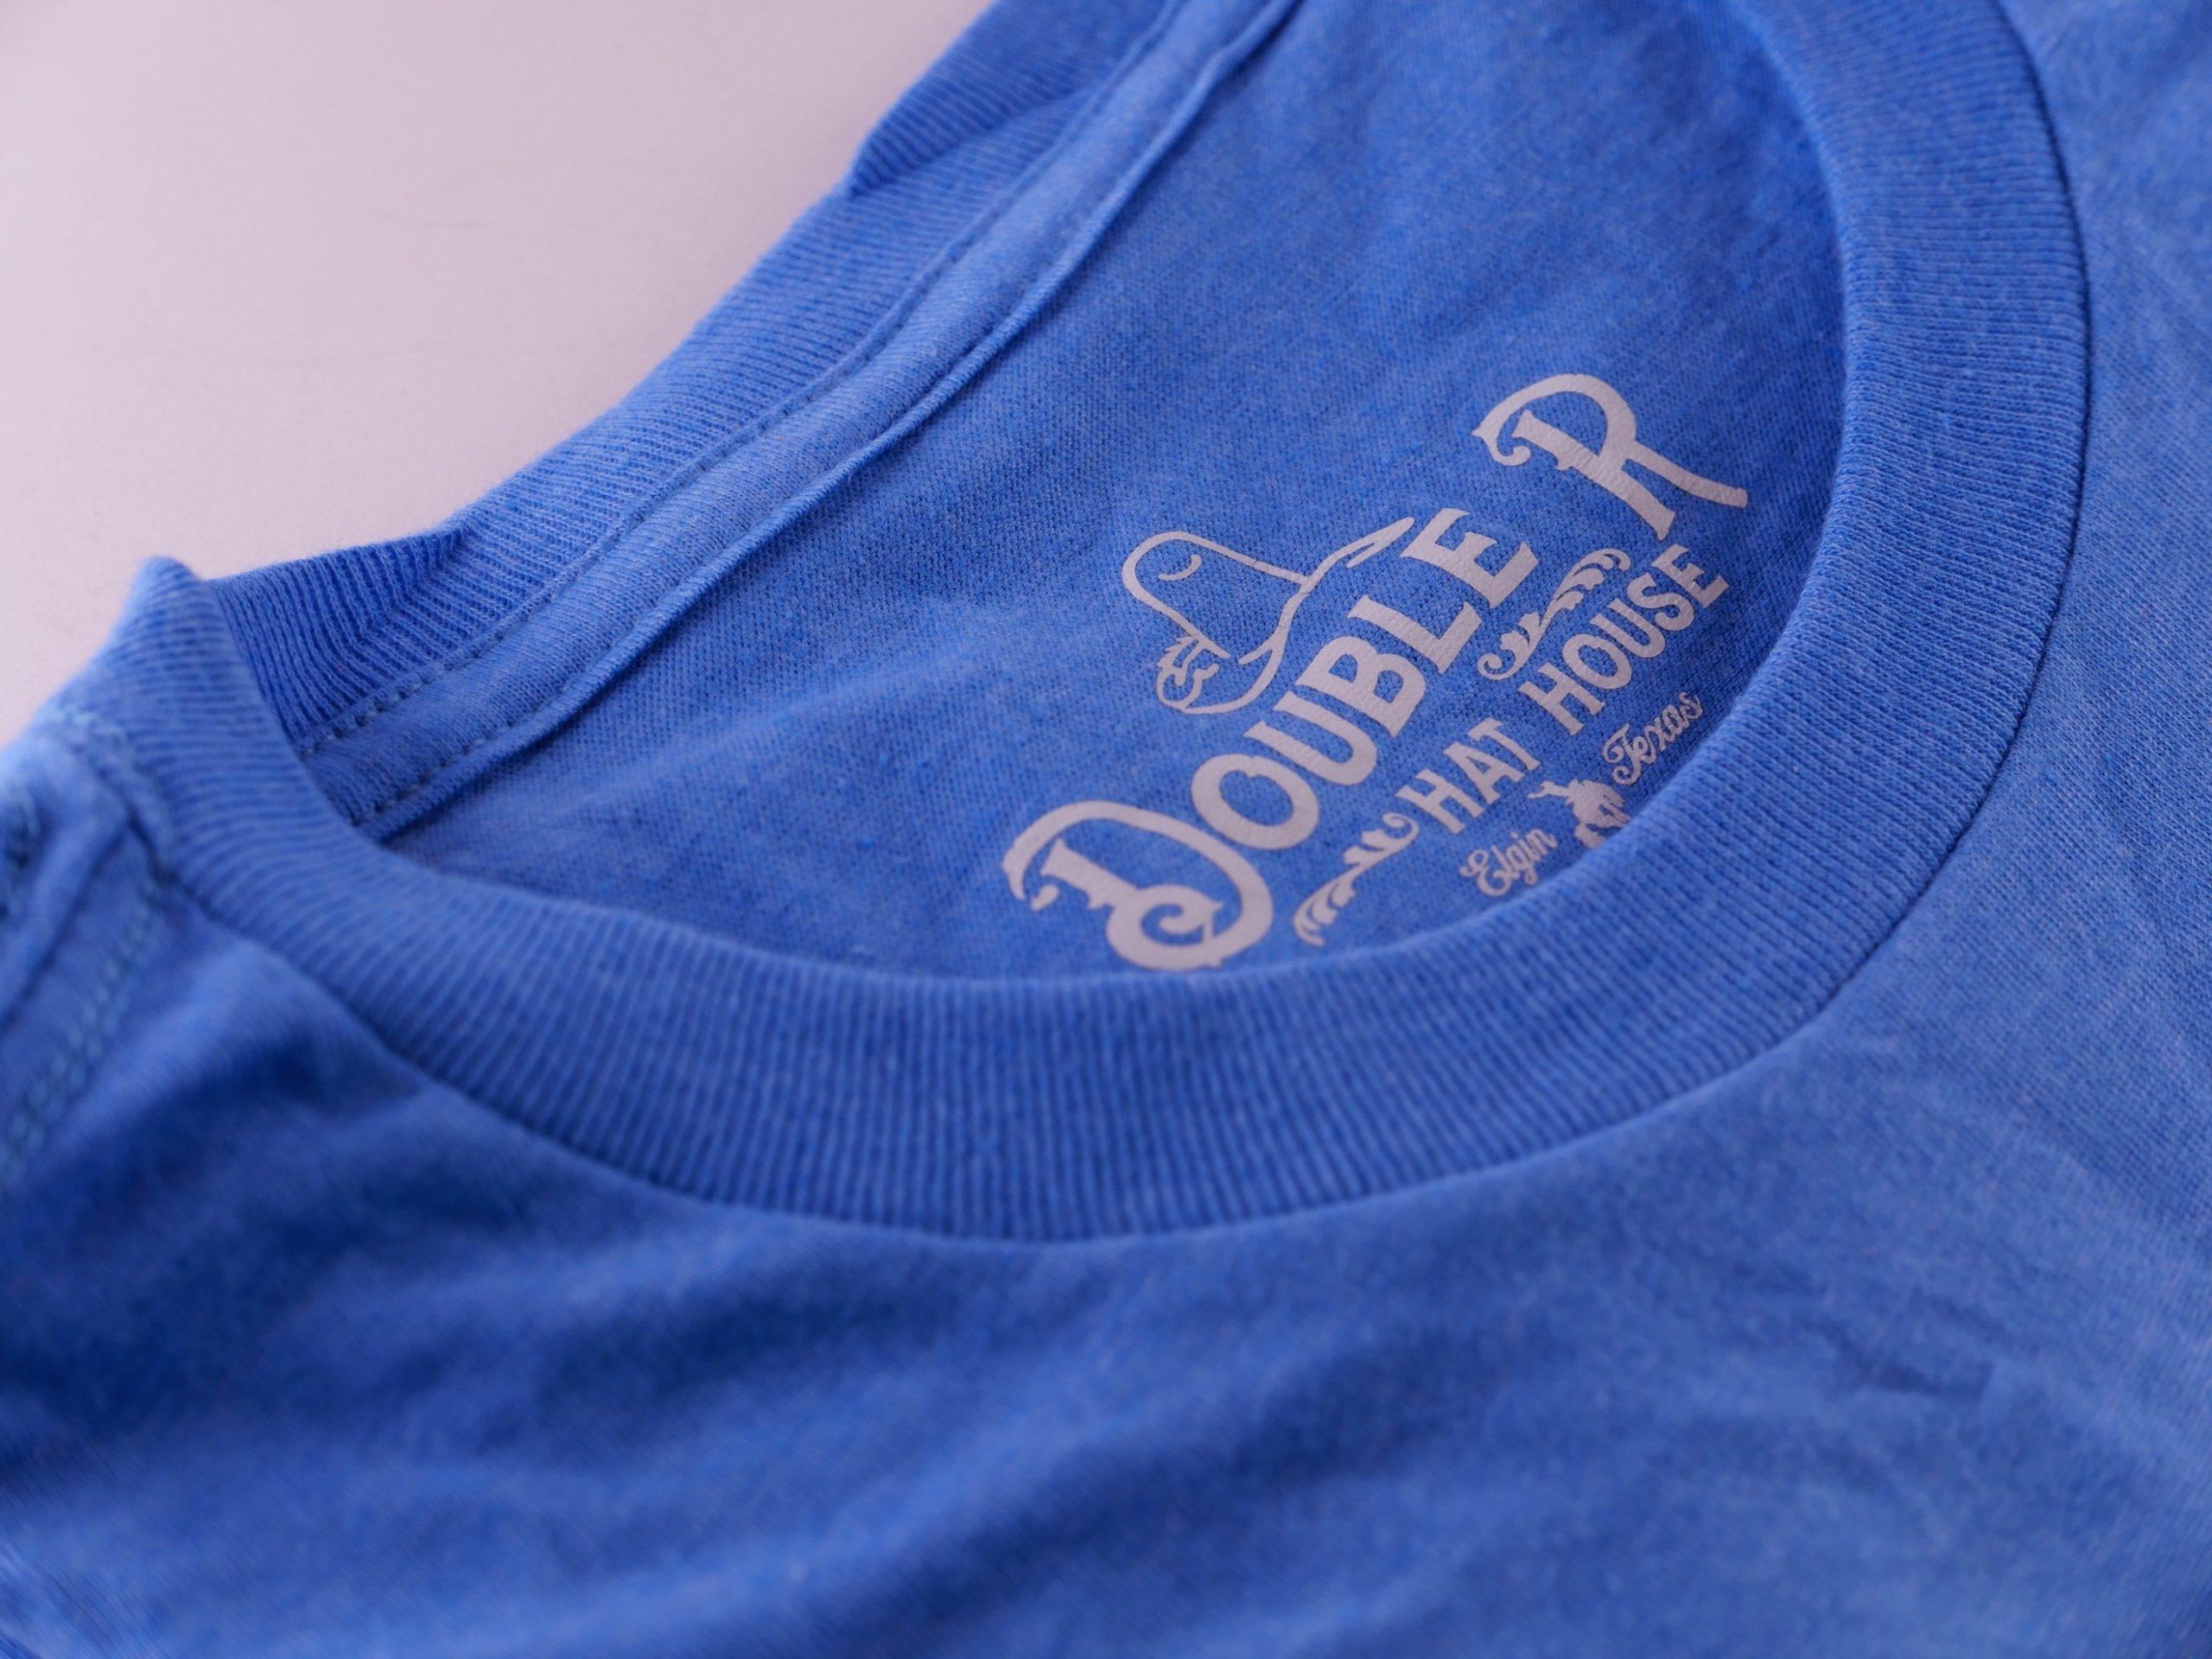 Direct-To-Garment Printing Vs. Screen Printing